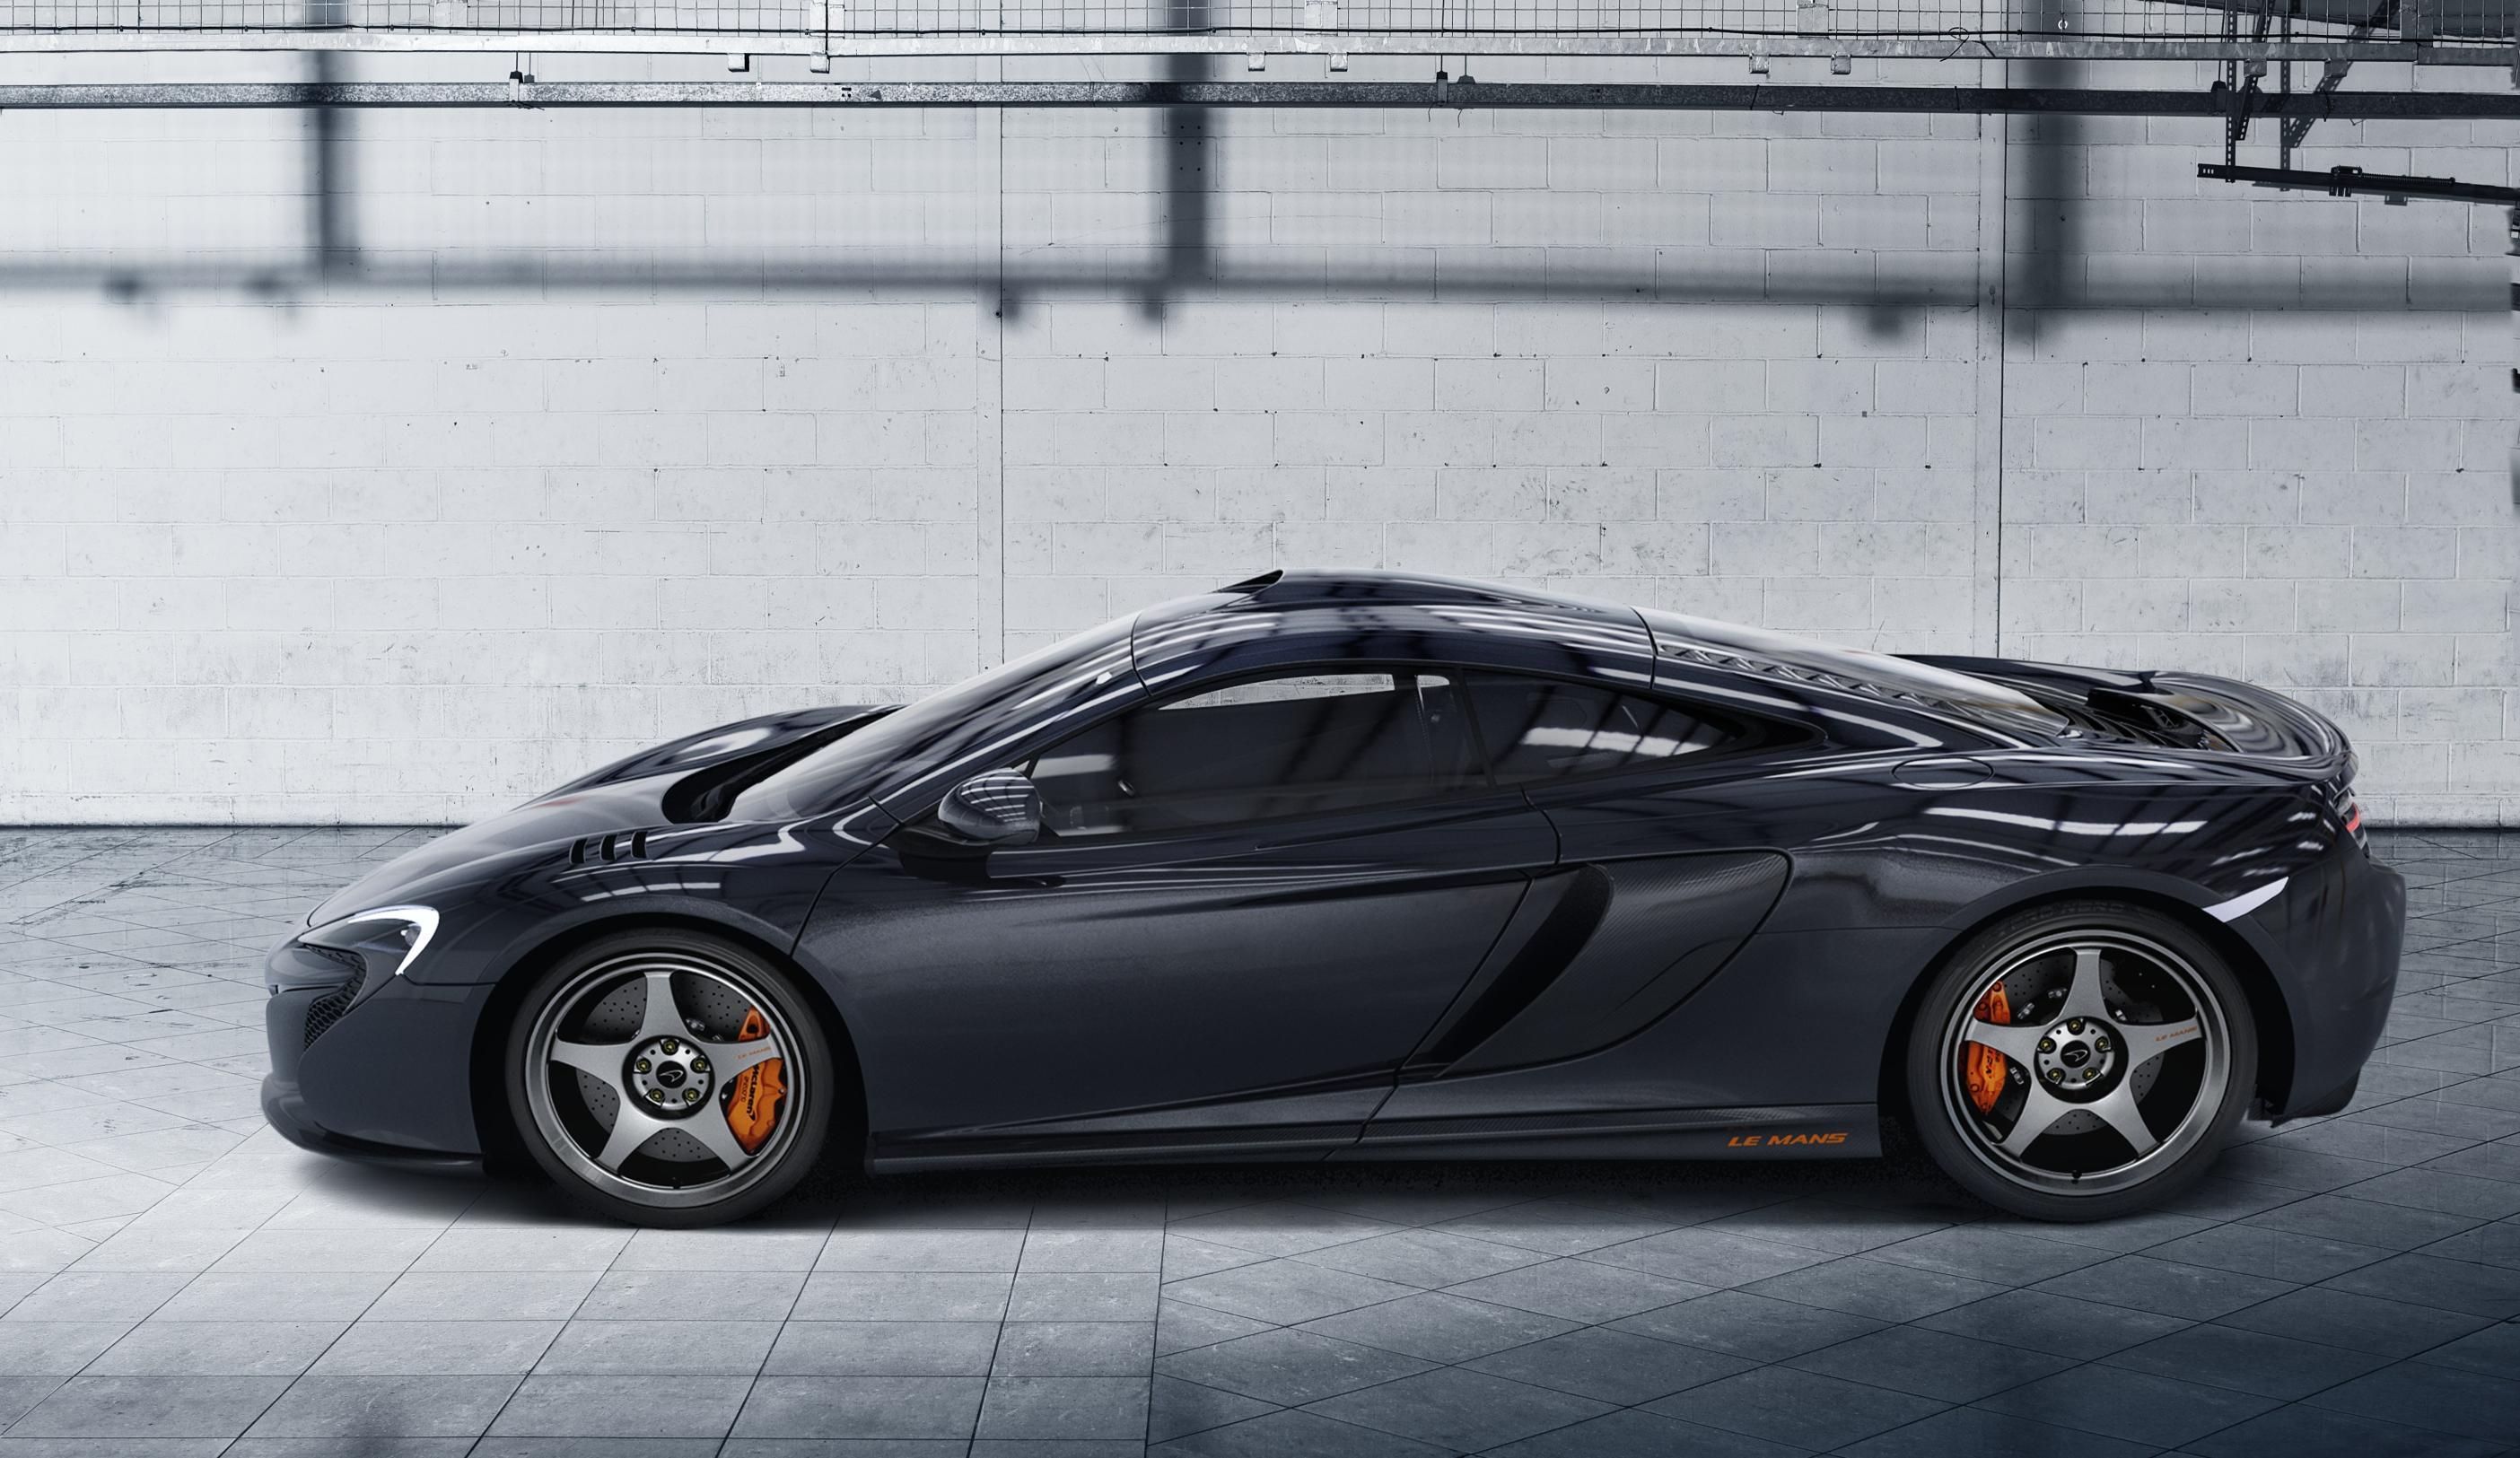 S0-McLaren-presente-la-serie-speciale-650S-Le-Mans-342860